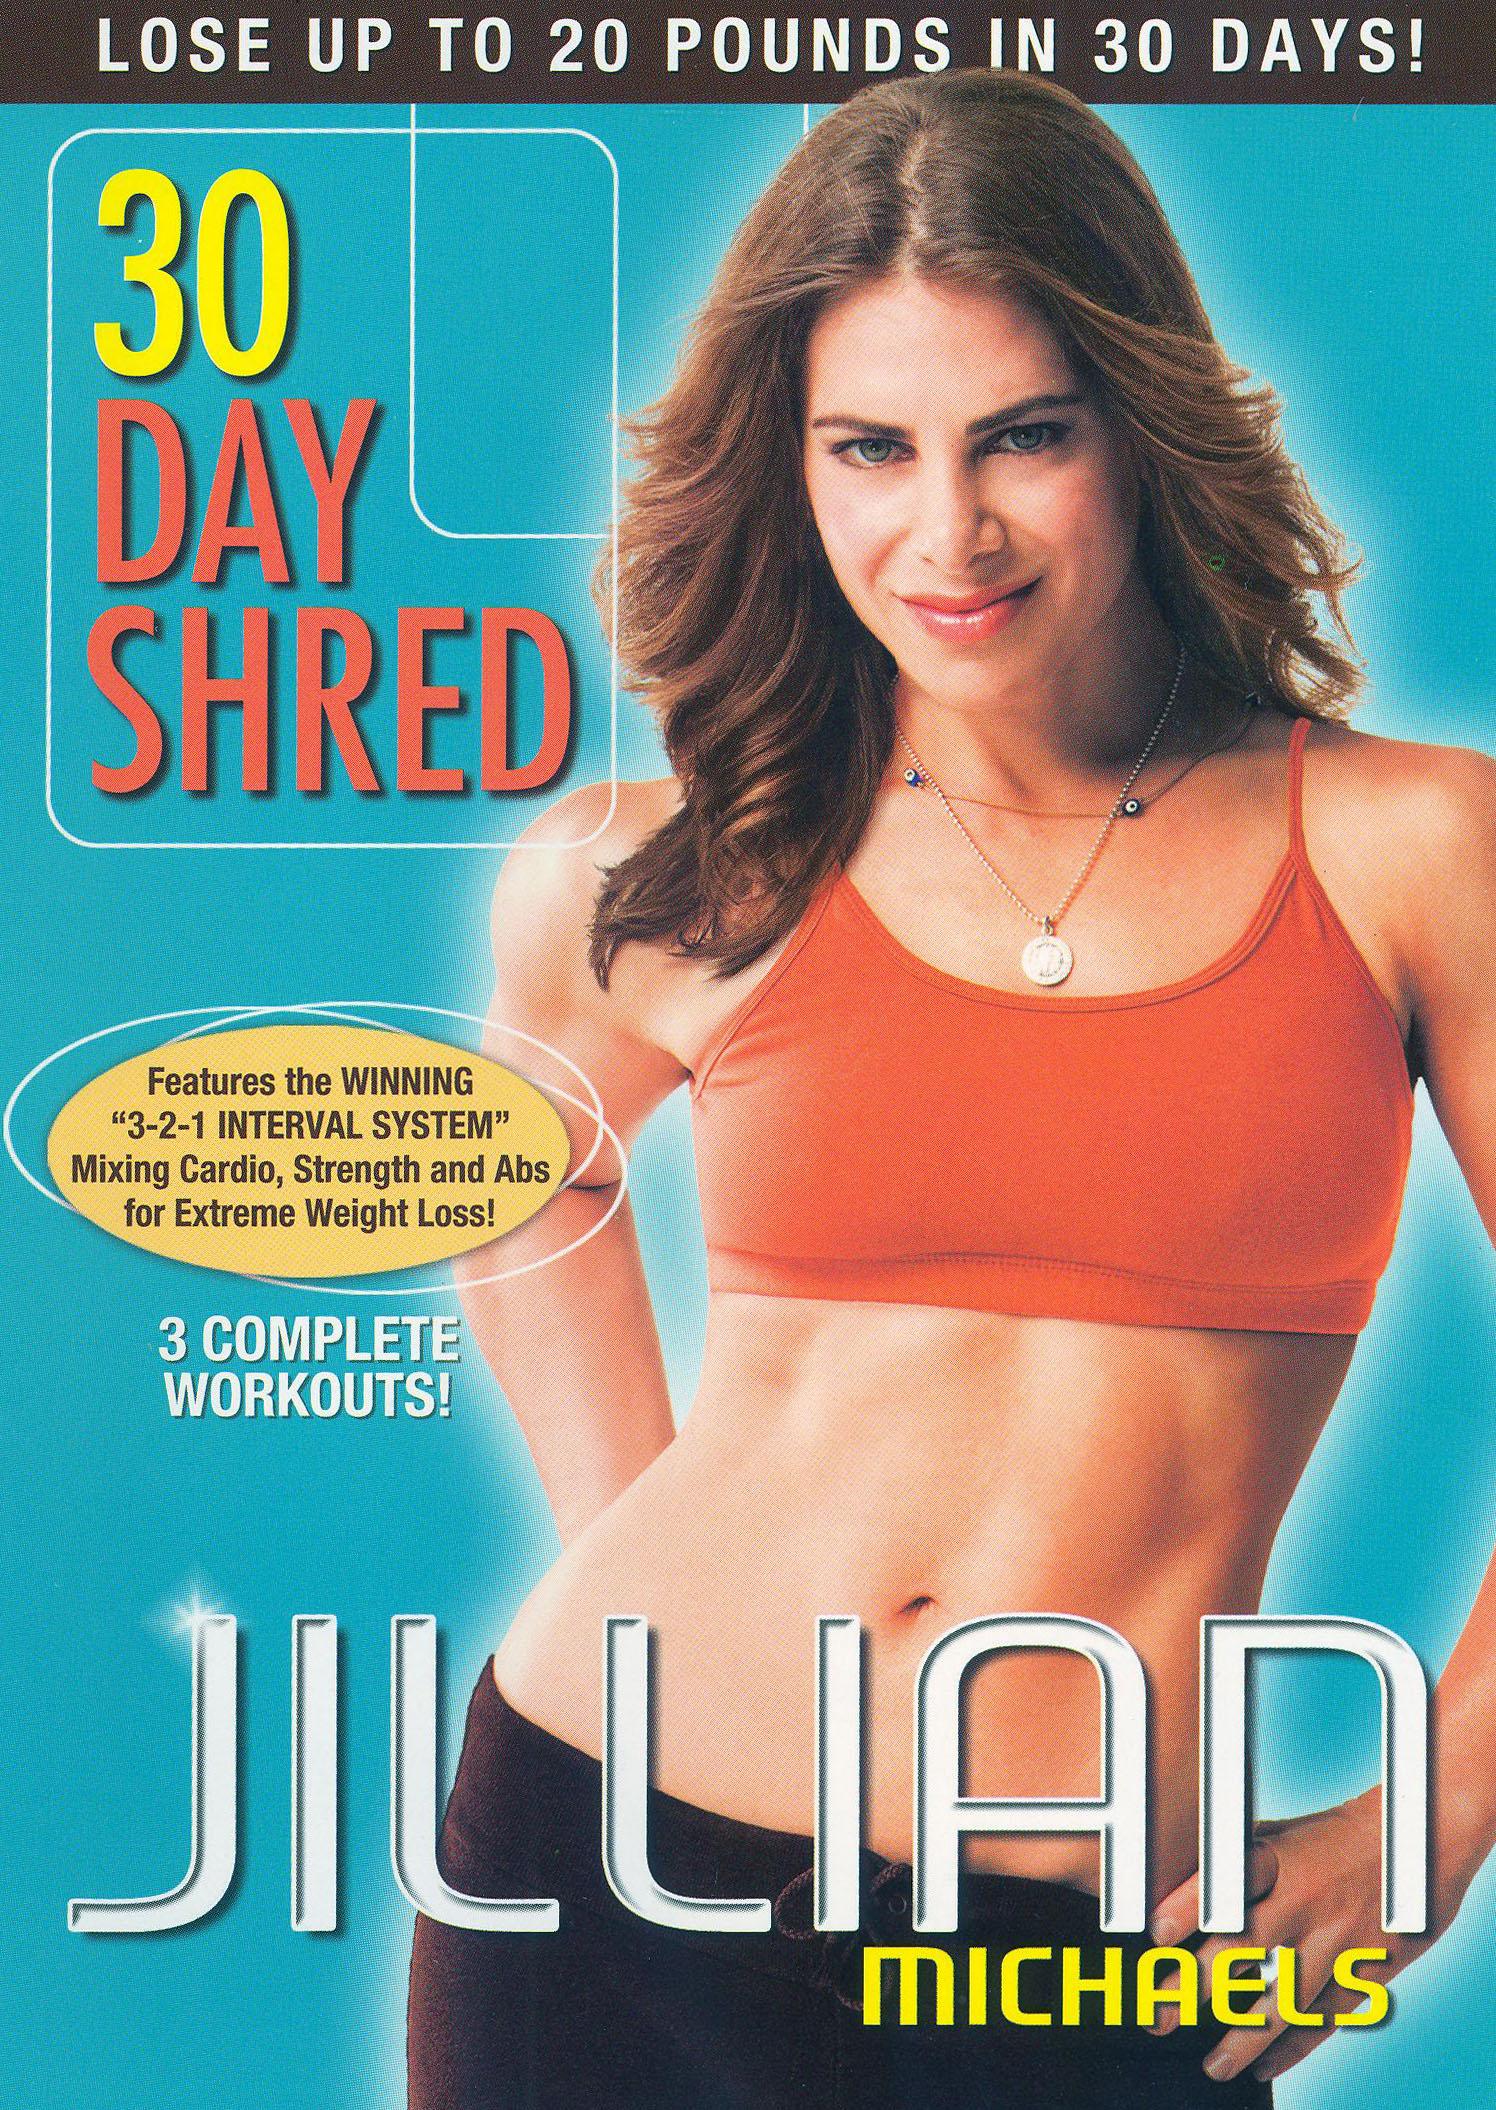 Jillian Michaels: 30 Day Shred (dvd) 8707731